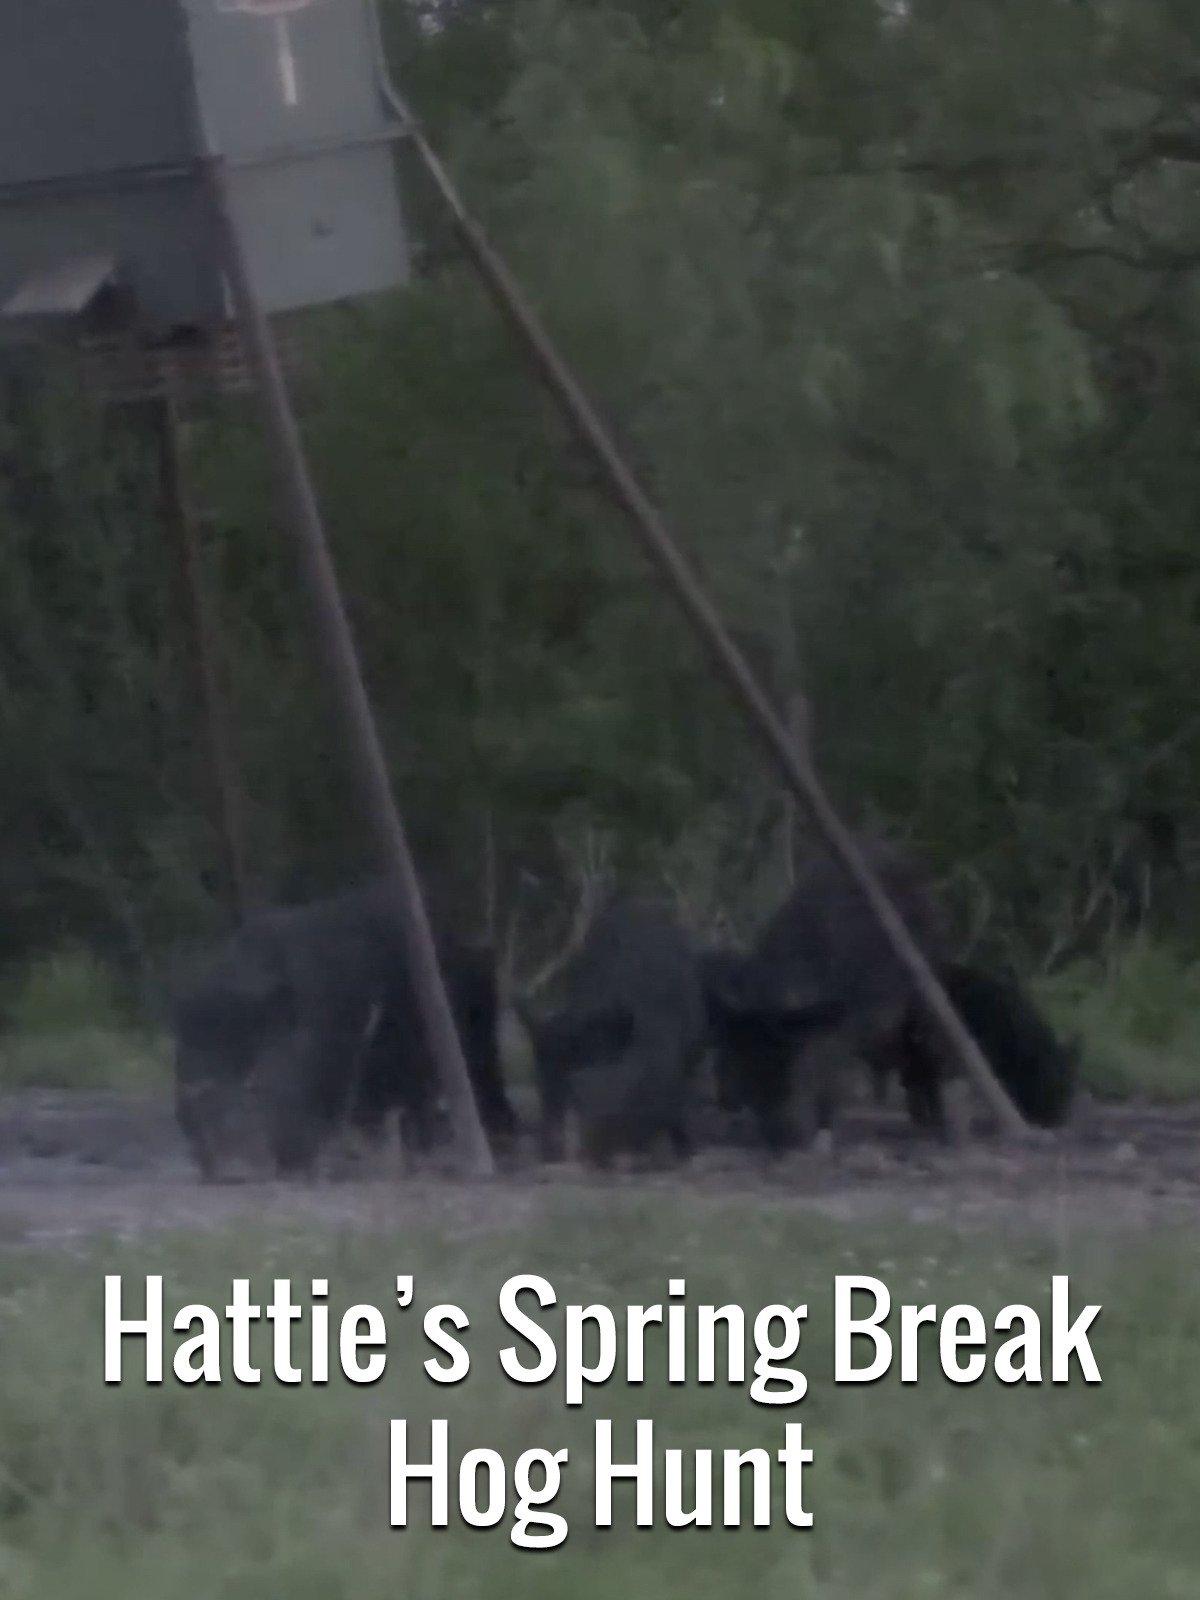 Hattie's Spring Break Hog Hunt